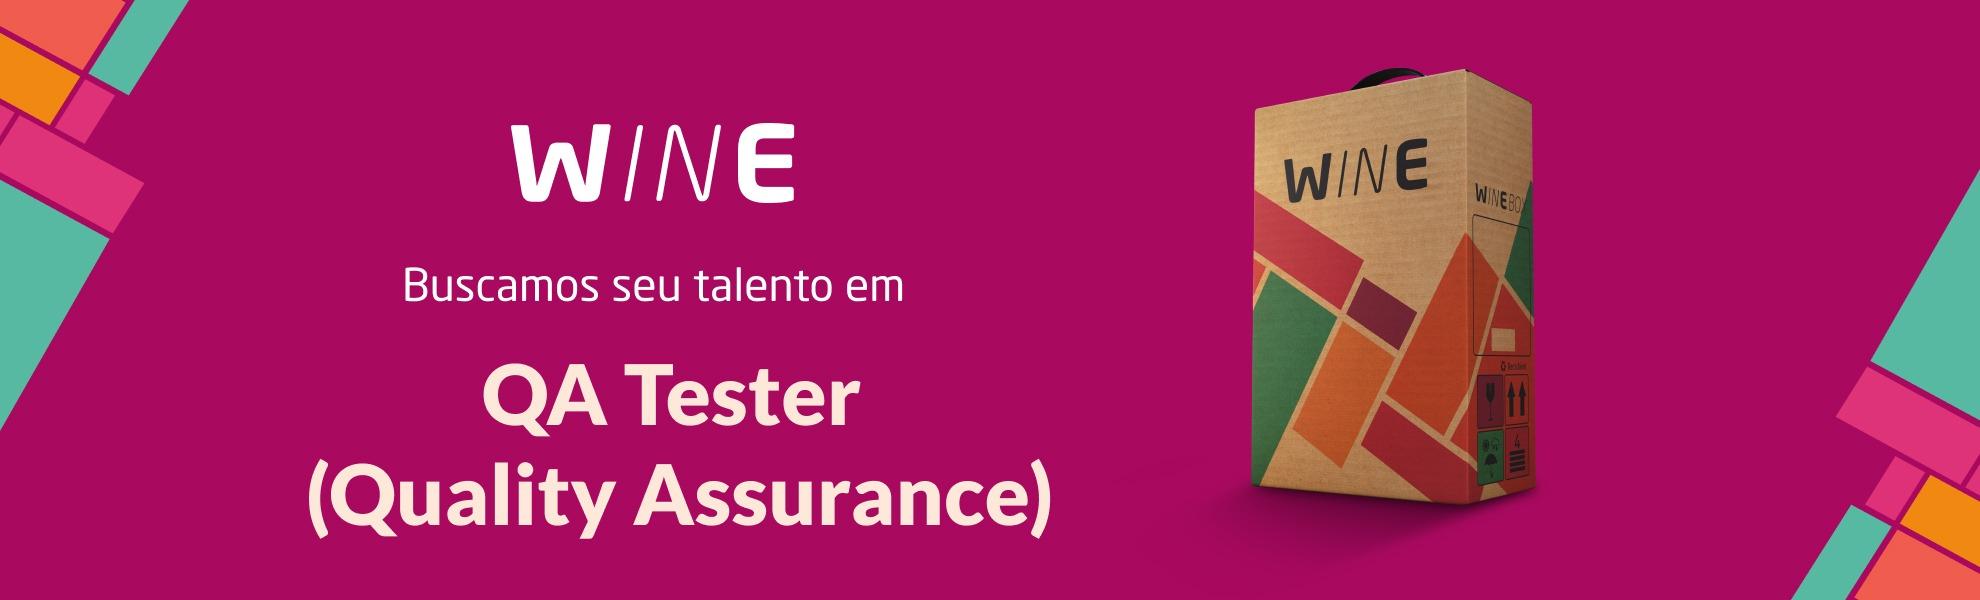 QA Tester (Quality Assurance)